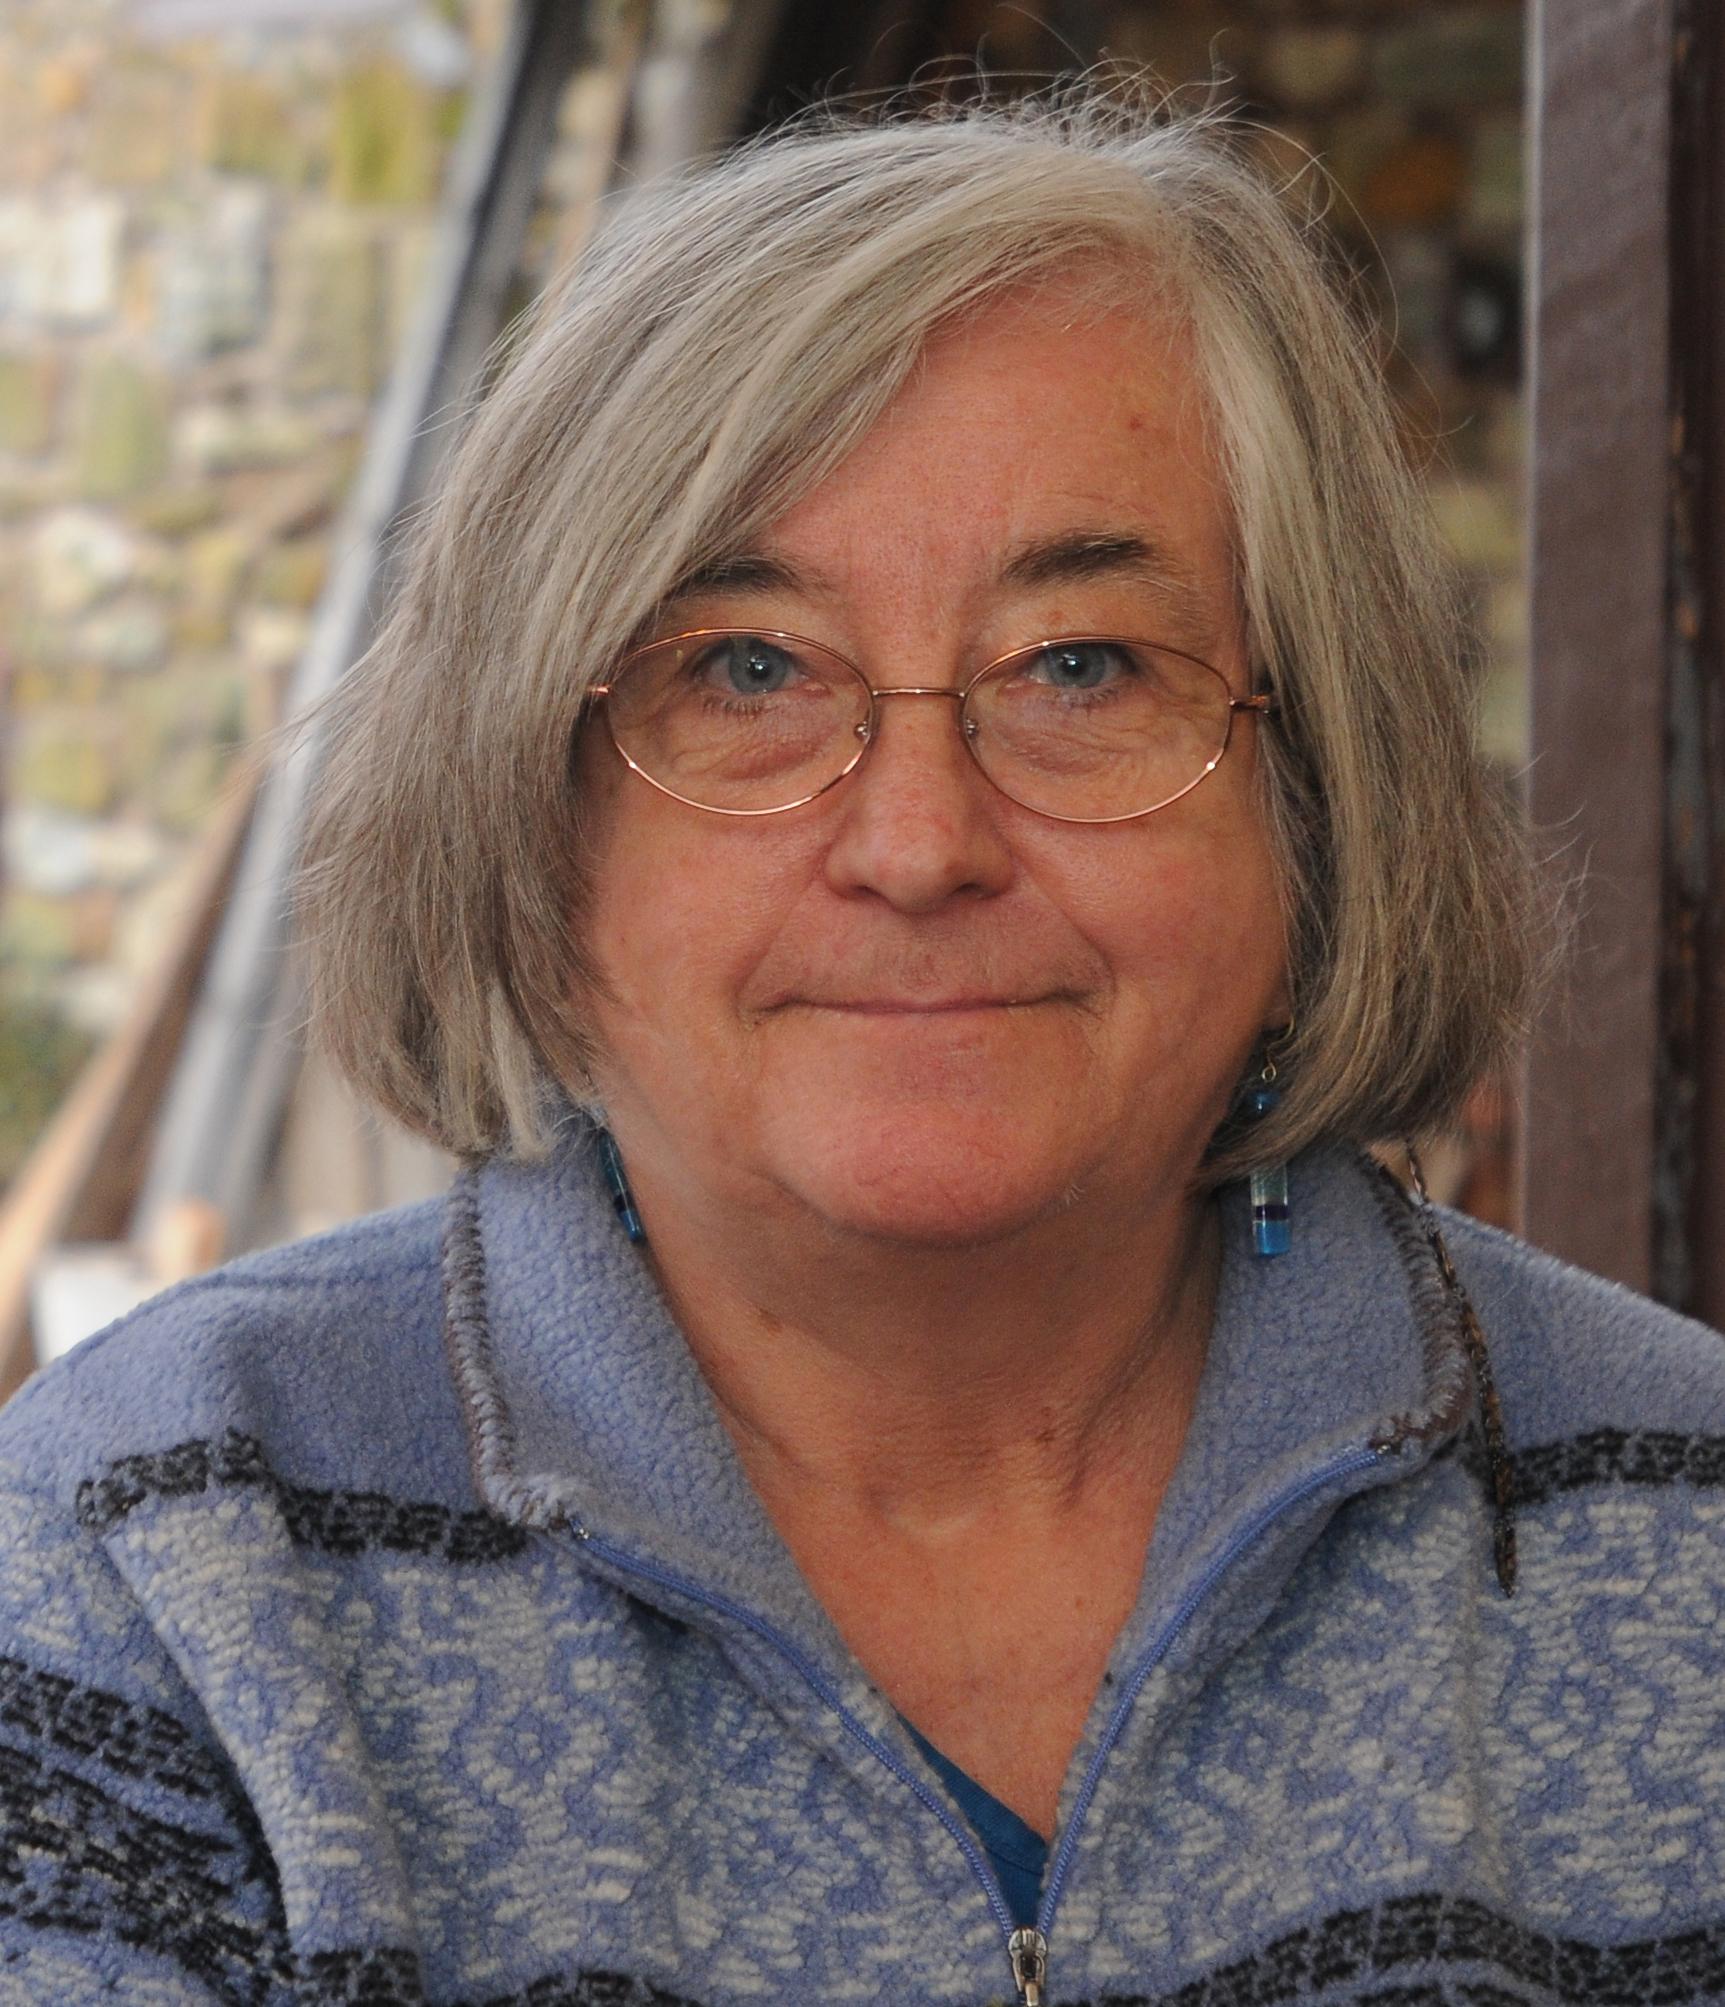 Lynn Landmesser